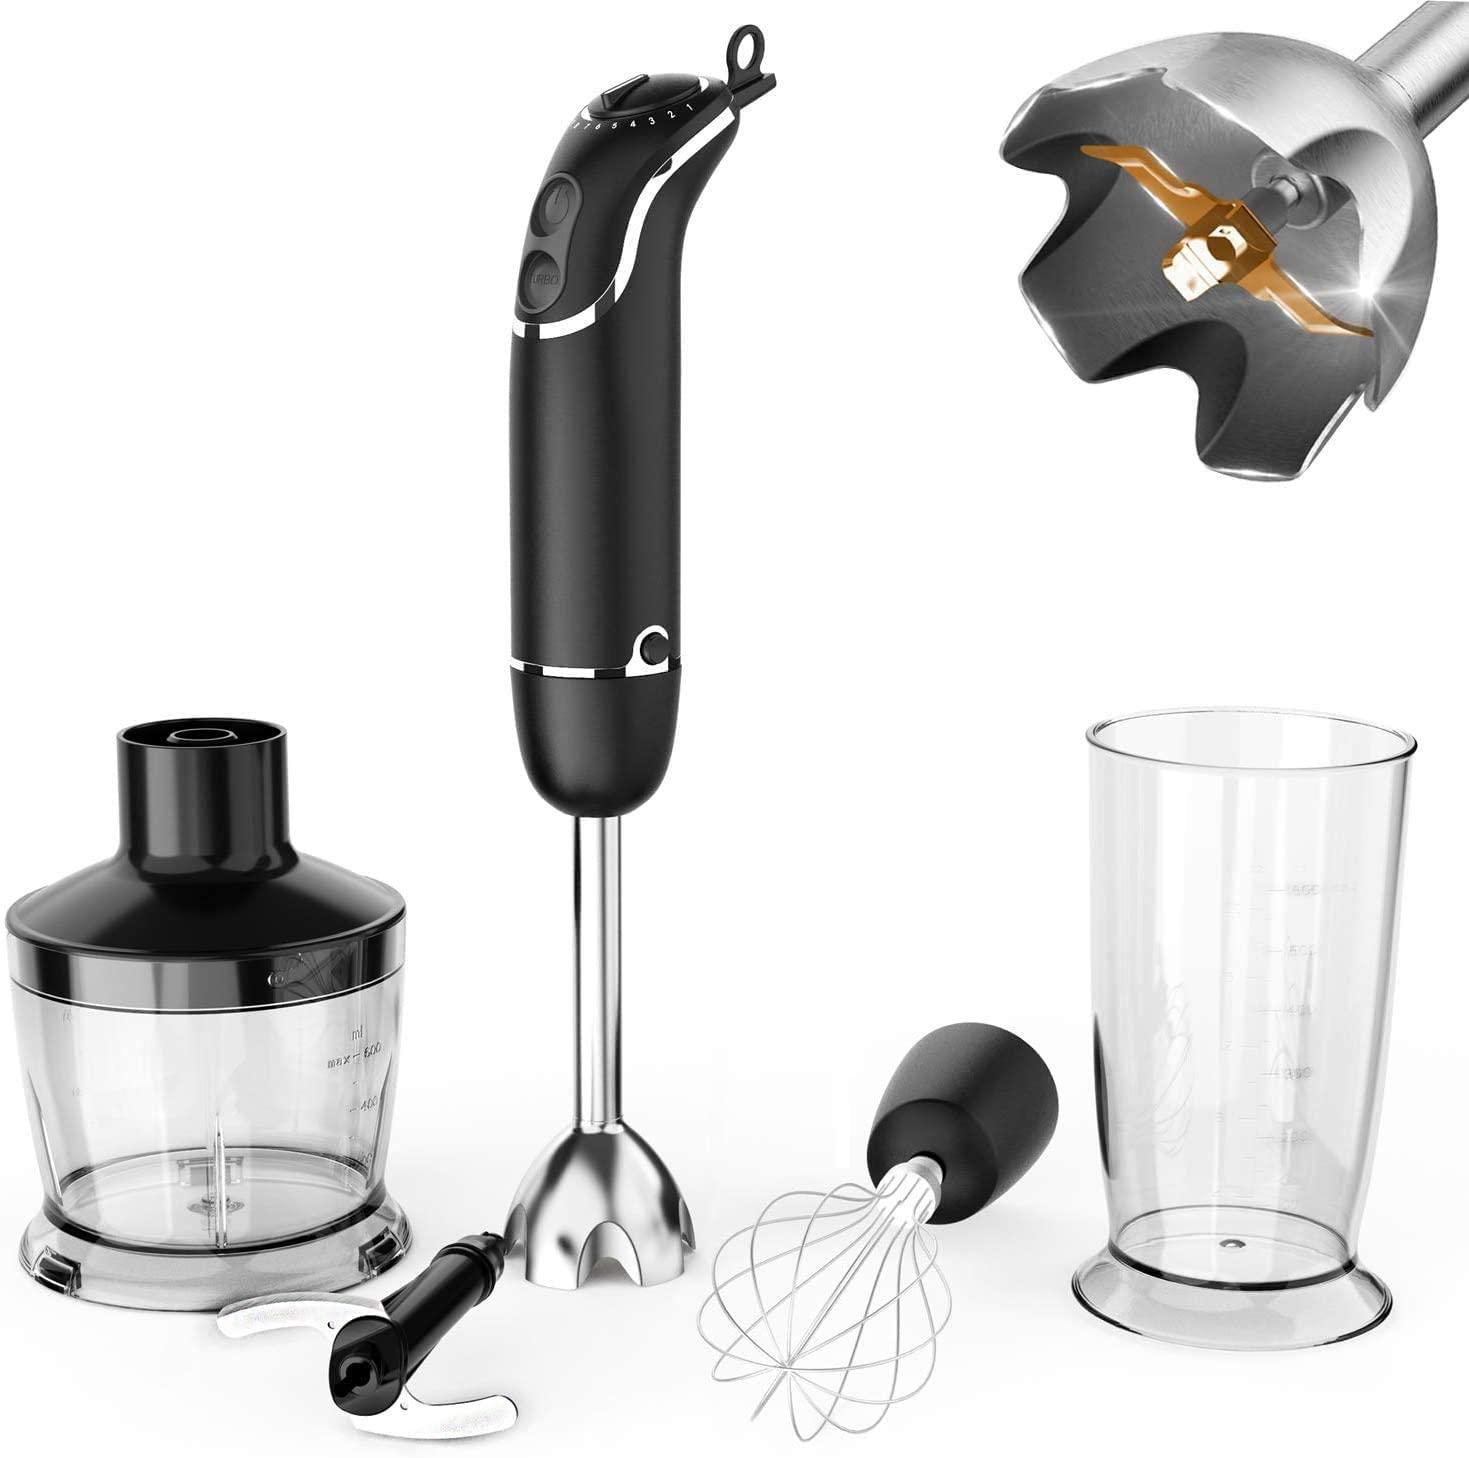 [US Direct] KOIOS 800-Watt/12-Speed Immersion Hand Blender, Turbo for Finer Results, 4-in-1 Set Includes Food Chopper / Egg Beater / Beaker